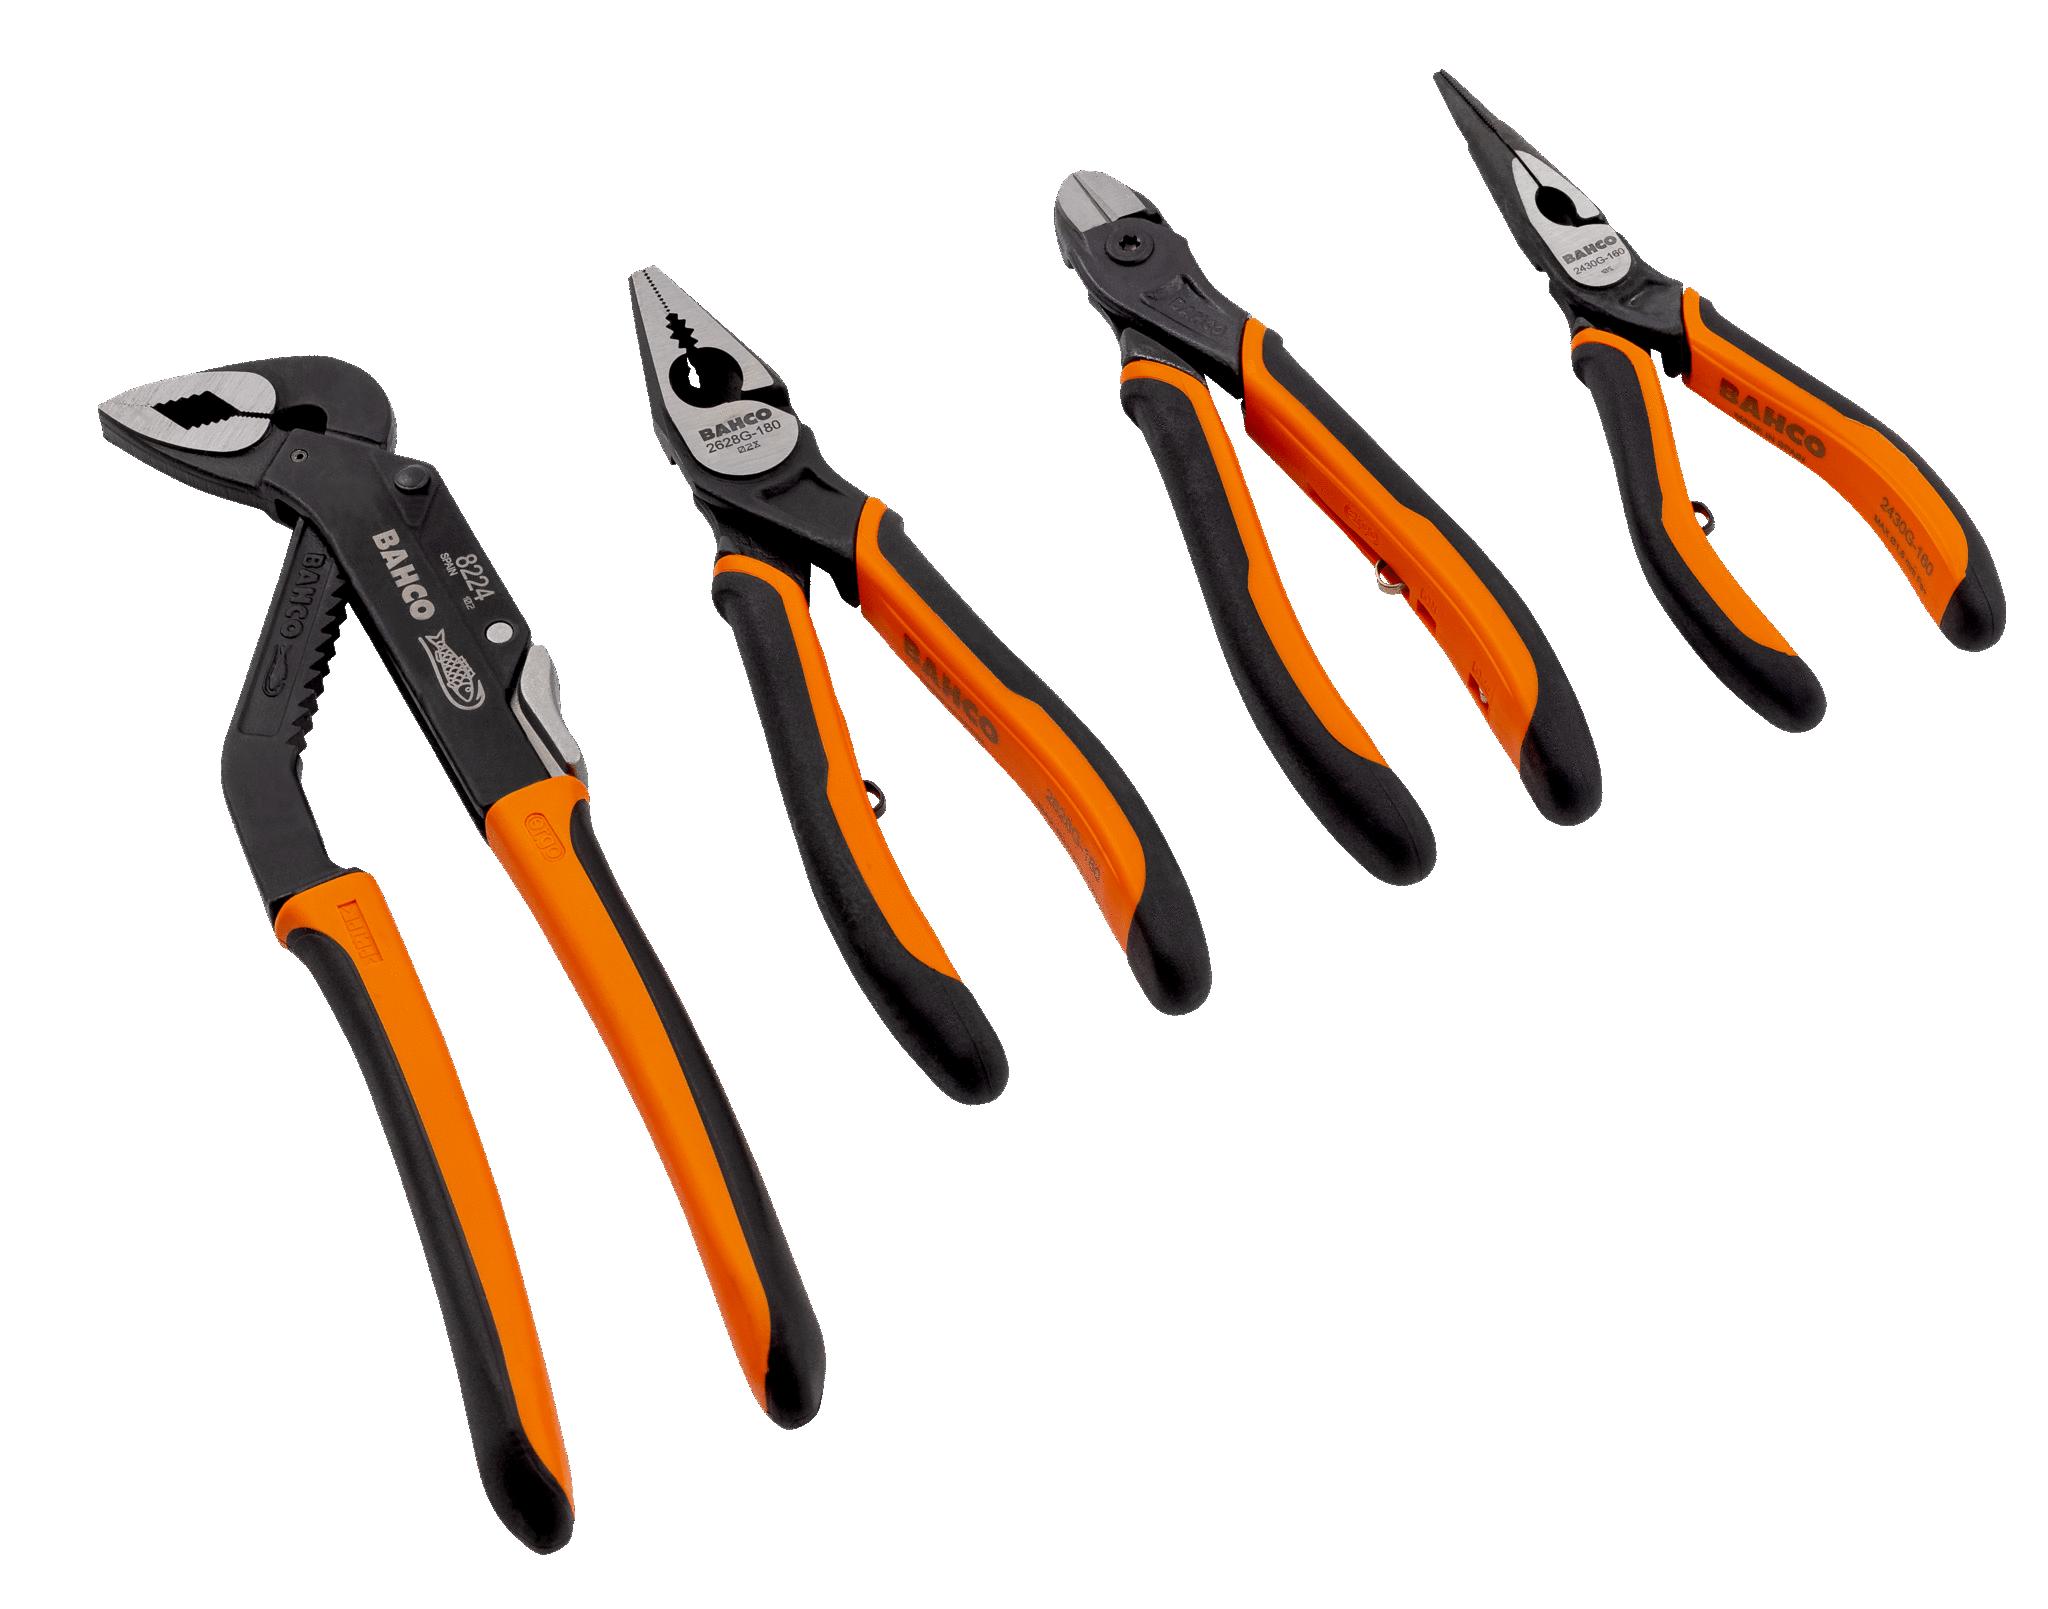 Plier Tool